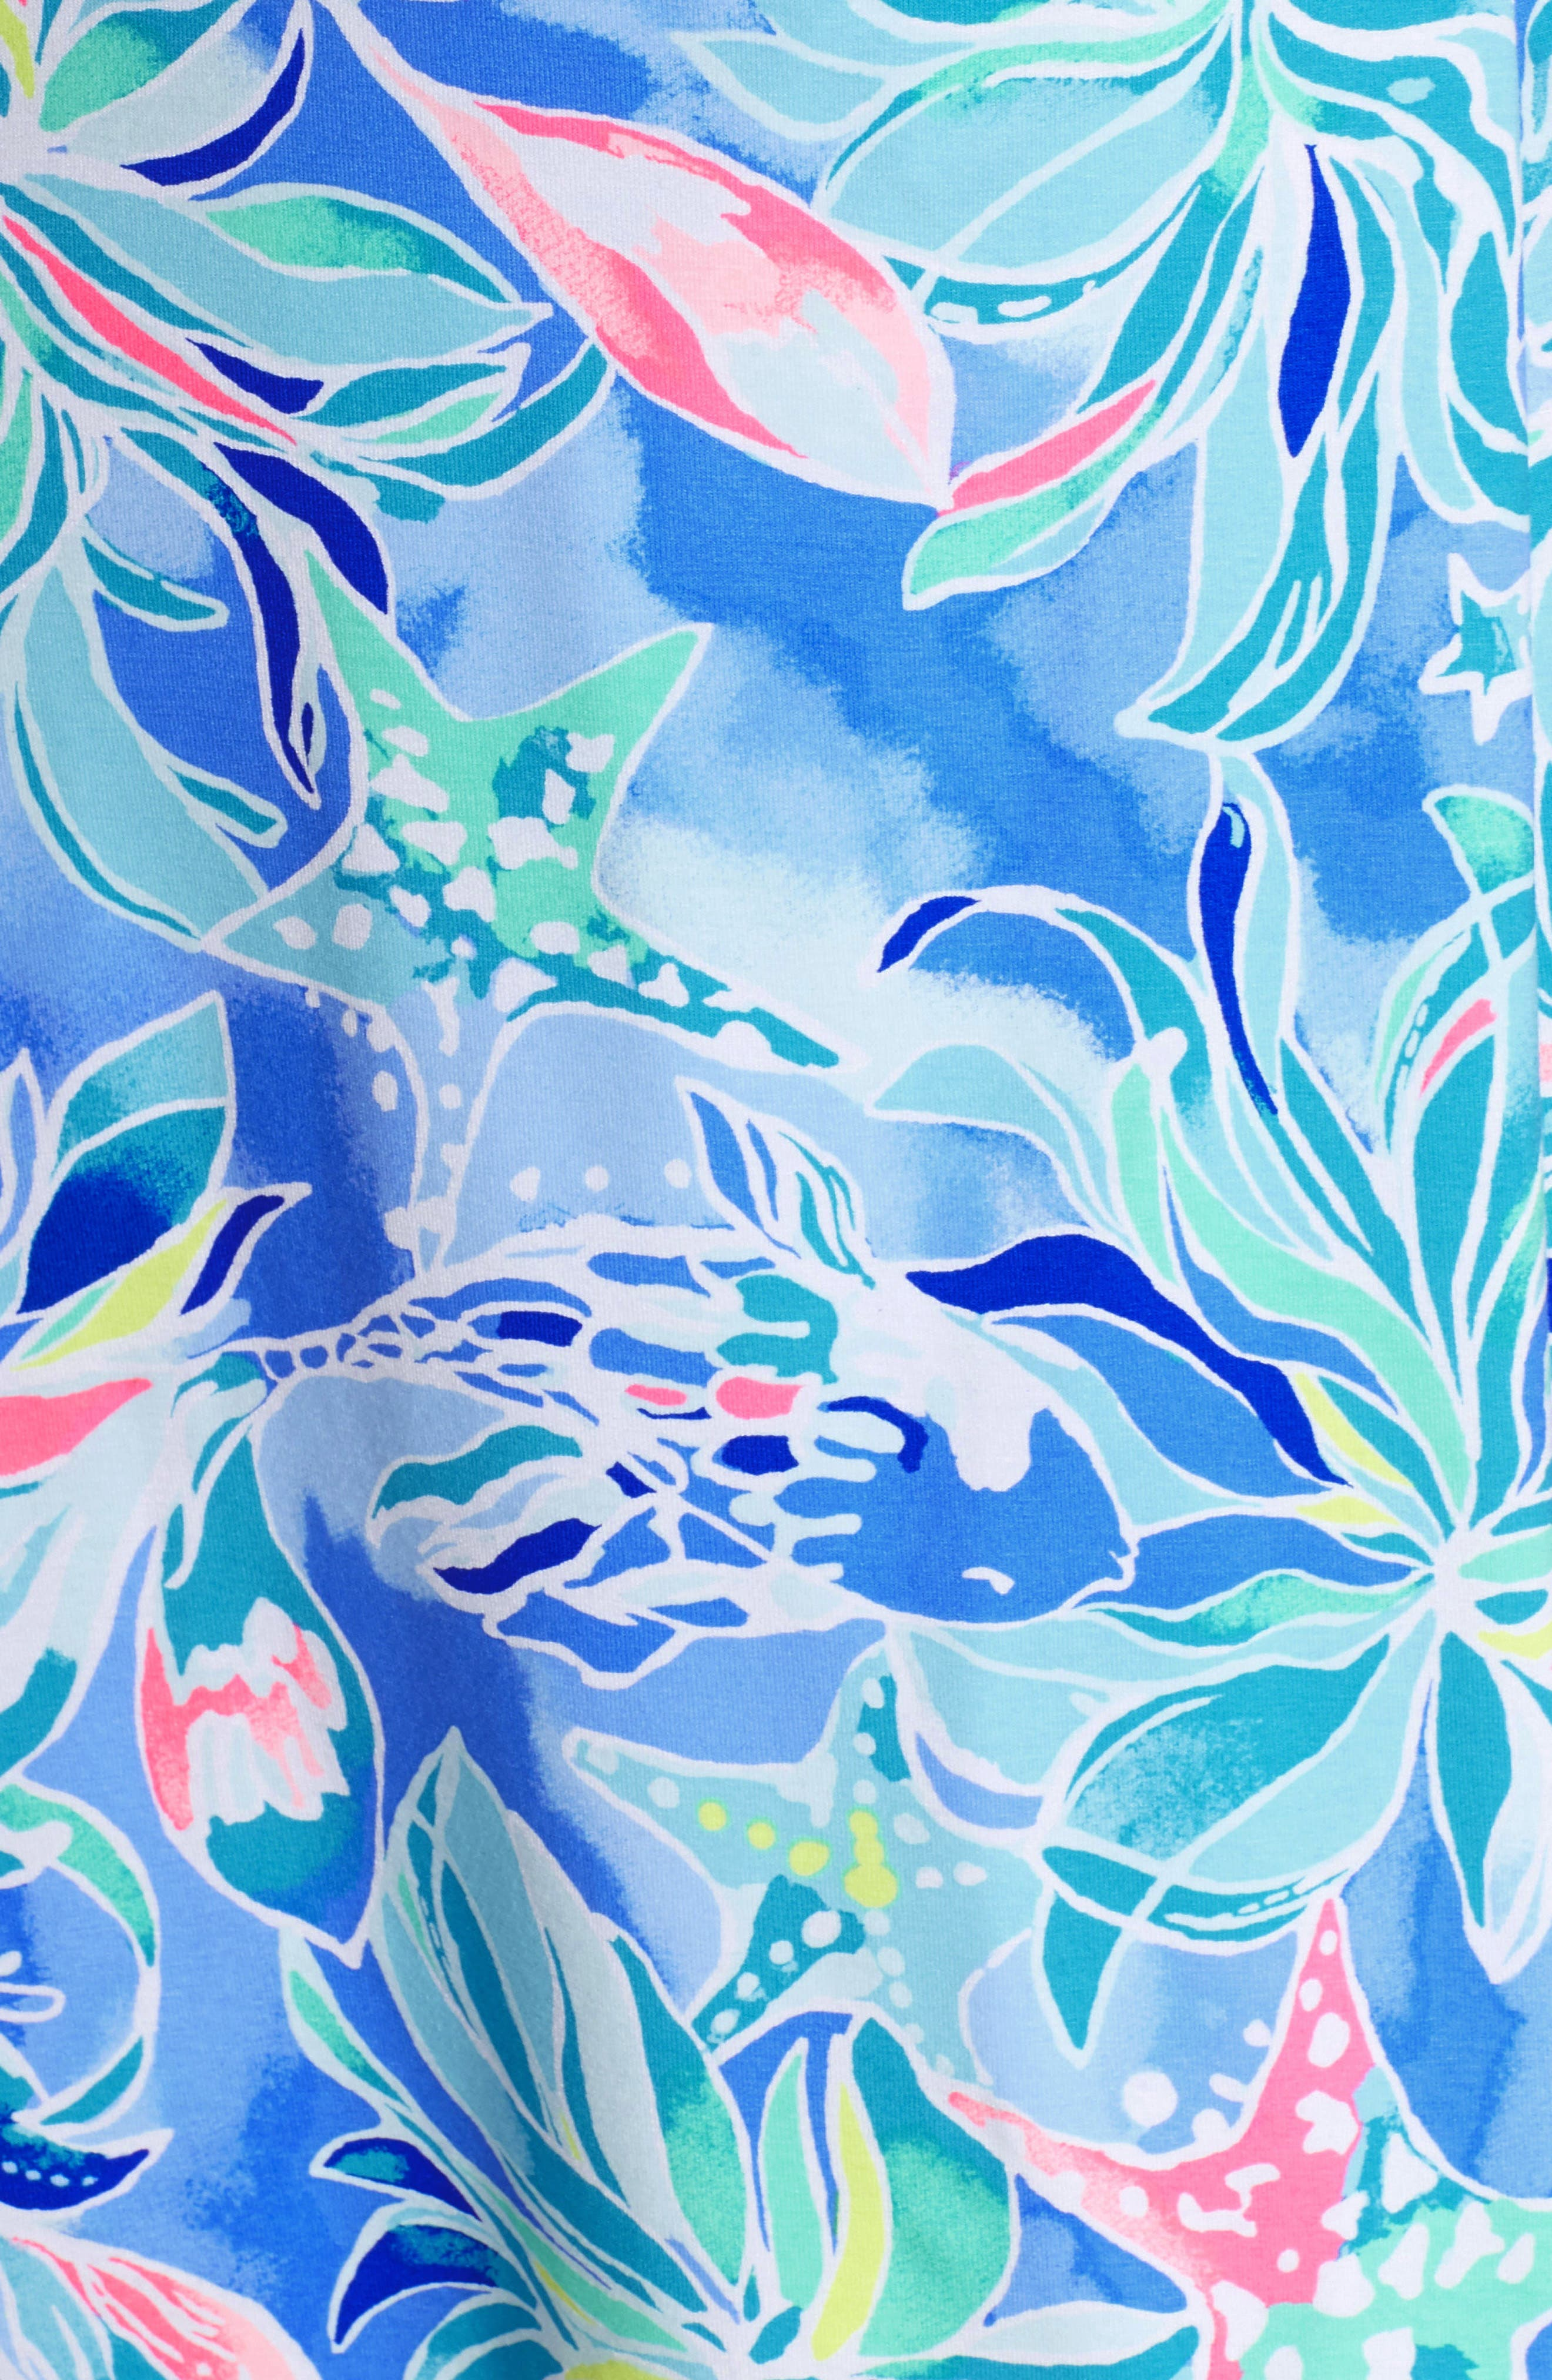 Karlie Wrap Romper,                             Alternate thumbnail 5, color,                             Bennet Blue Celestial Seas